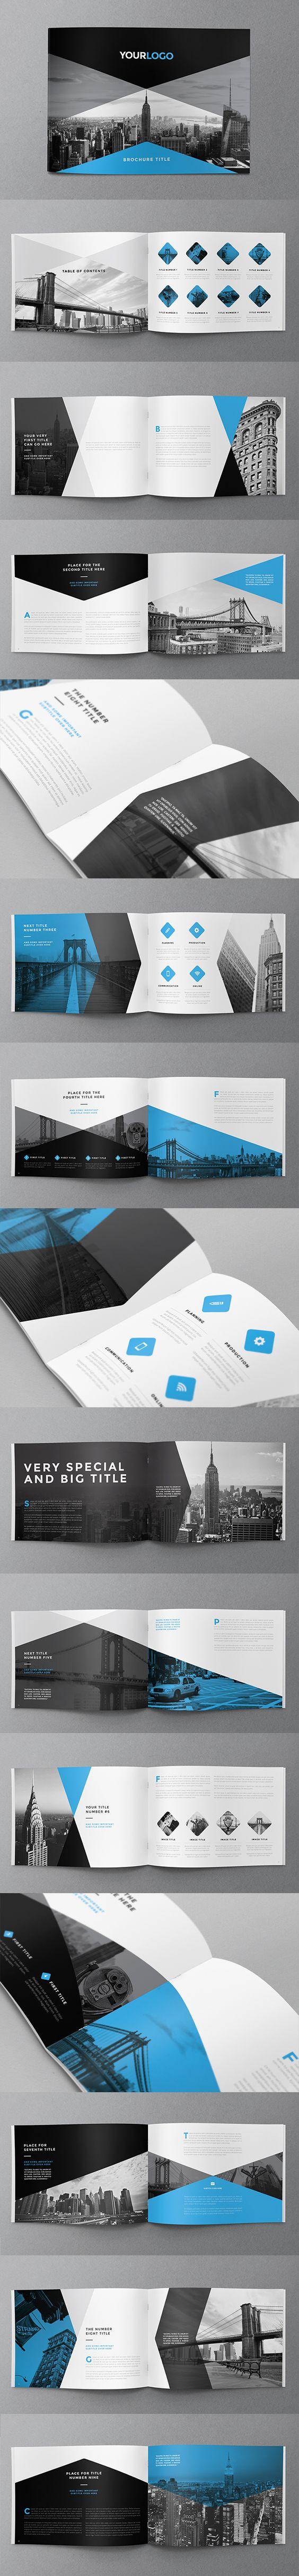 Minimal Modern Black & Blue Brochure. Download here: http://graphicriver.net/item/minimal-modern-black-blue-brochure/11663356?ref=abradesign